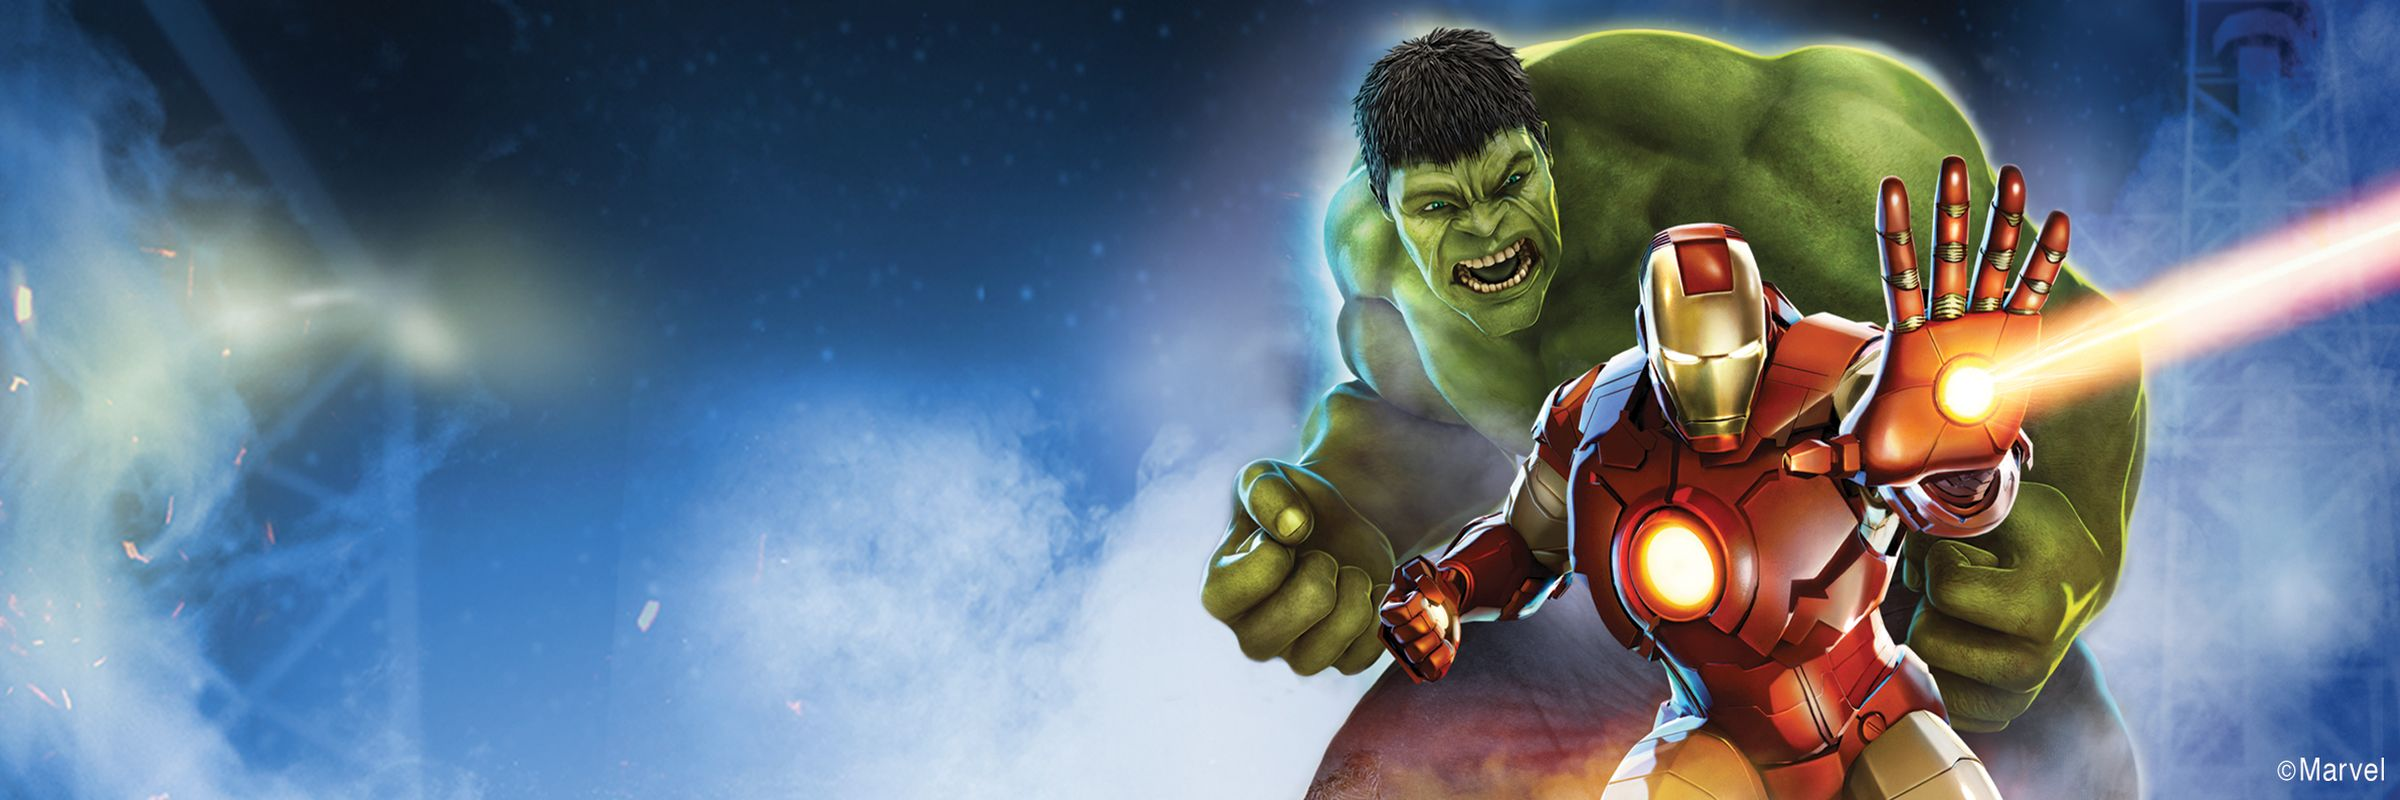 Marvel S Iron Man Hulk Heroes United Full Movie Movies Anywhere